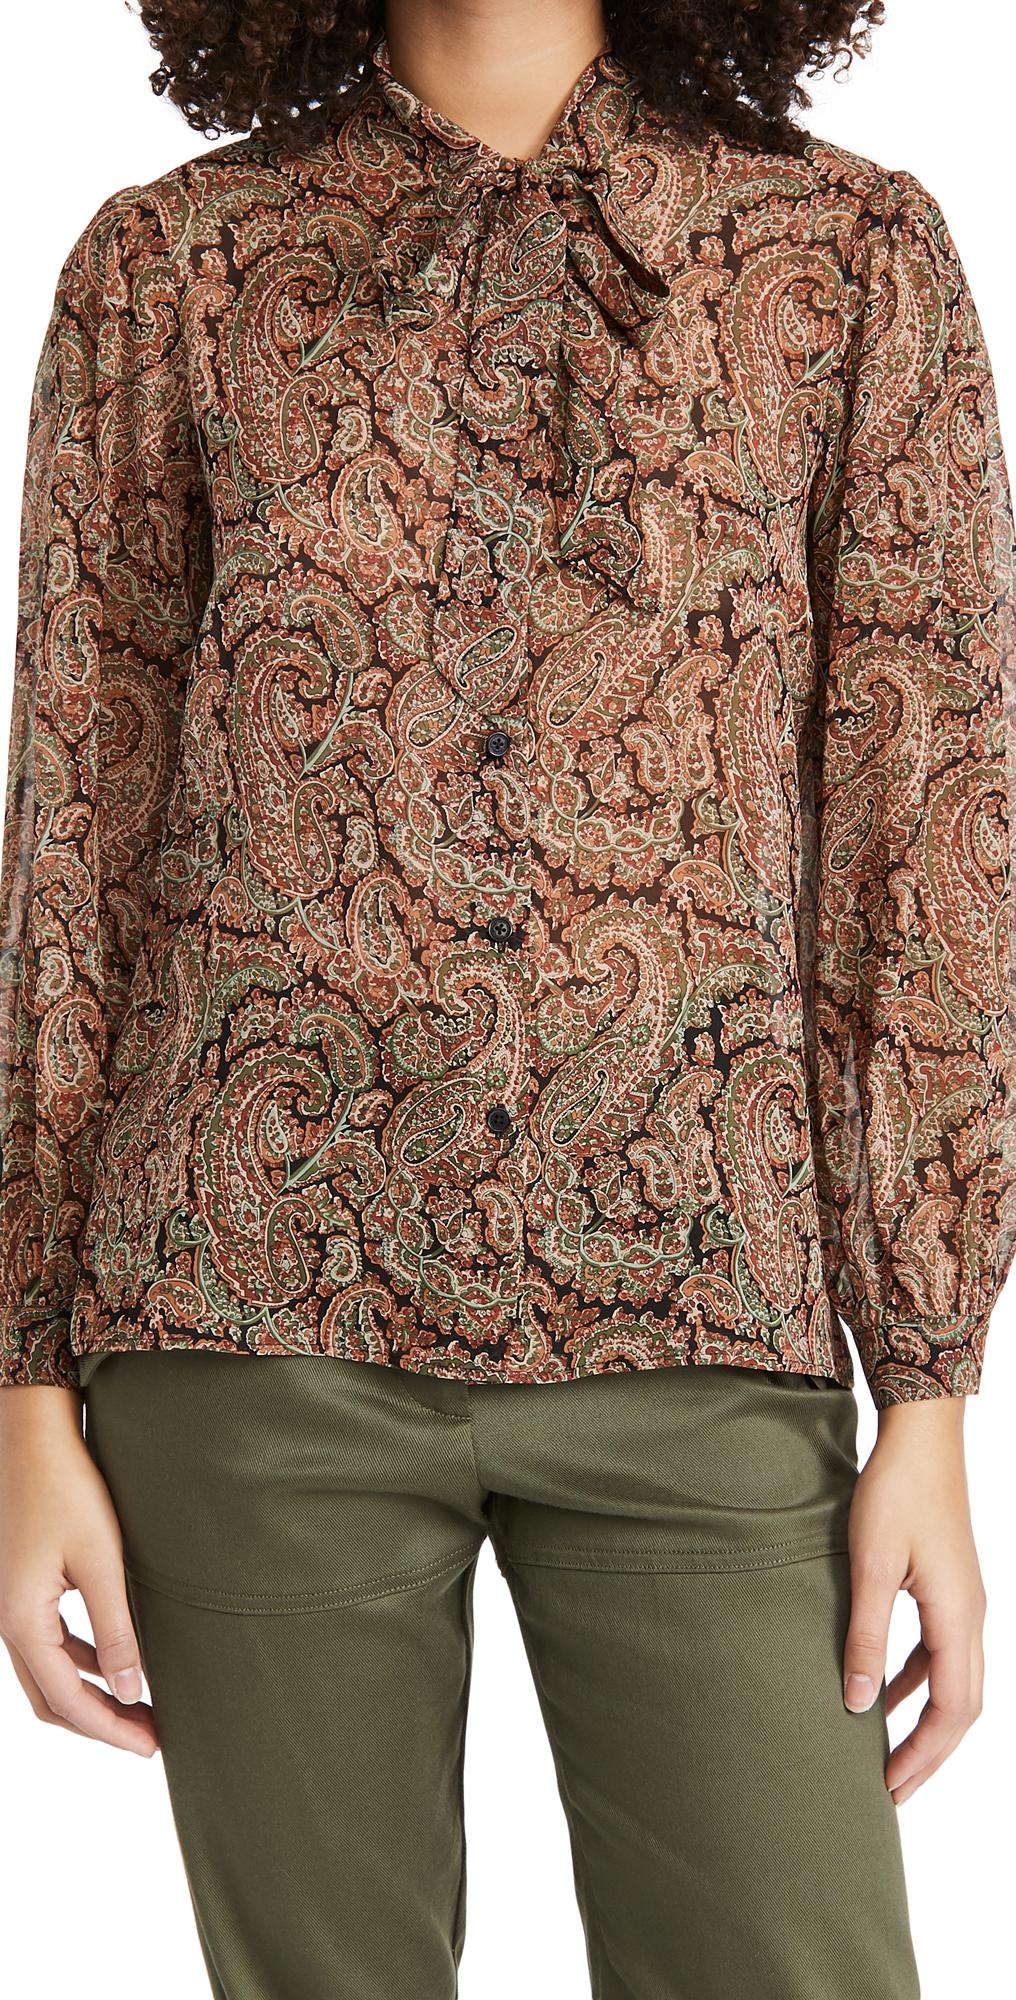 Nili Lotan Alessia Shirt